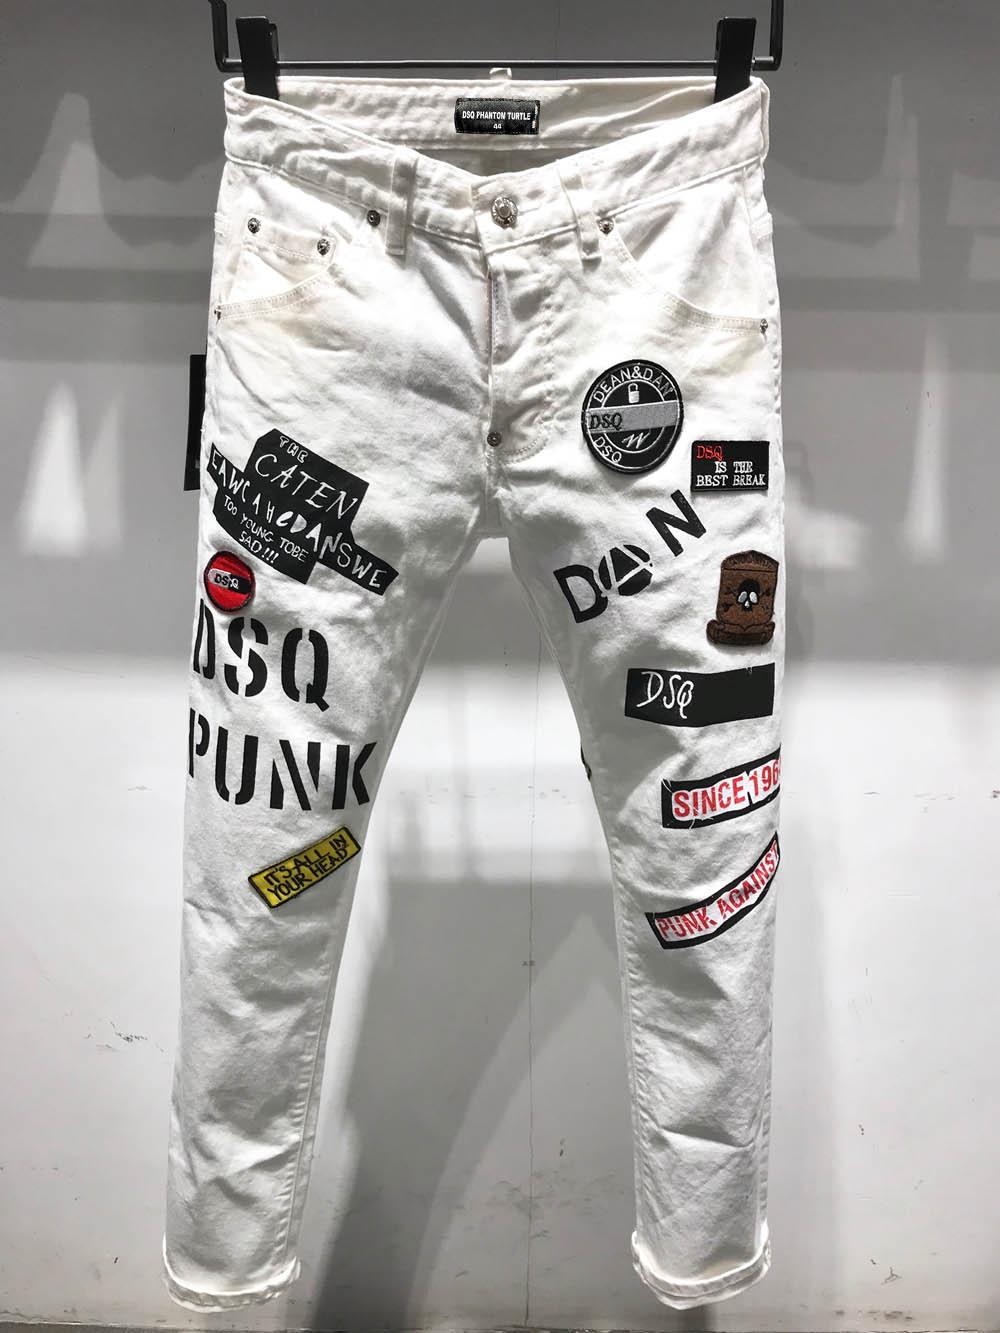 DSQ PHANTOM TURTLE Classic Fashion Man Jeans Hip Hop Rock Moto Mens Casual Design Ripped Jeans Distressed Skinny Denim Biker DSQ Jeans 6929